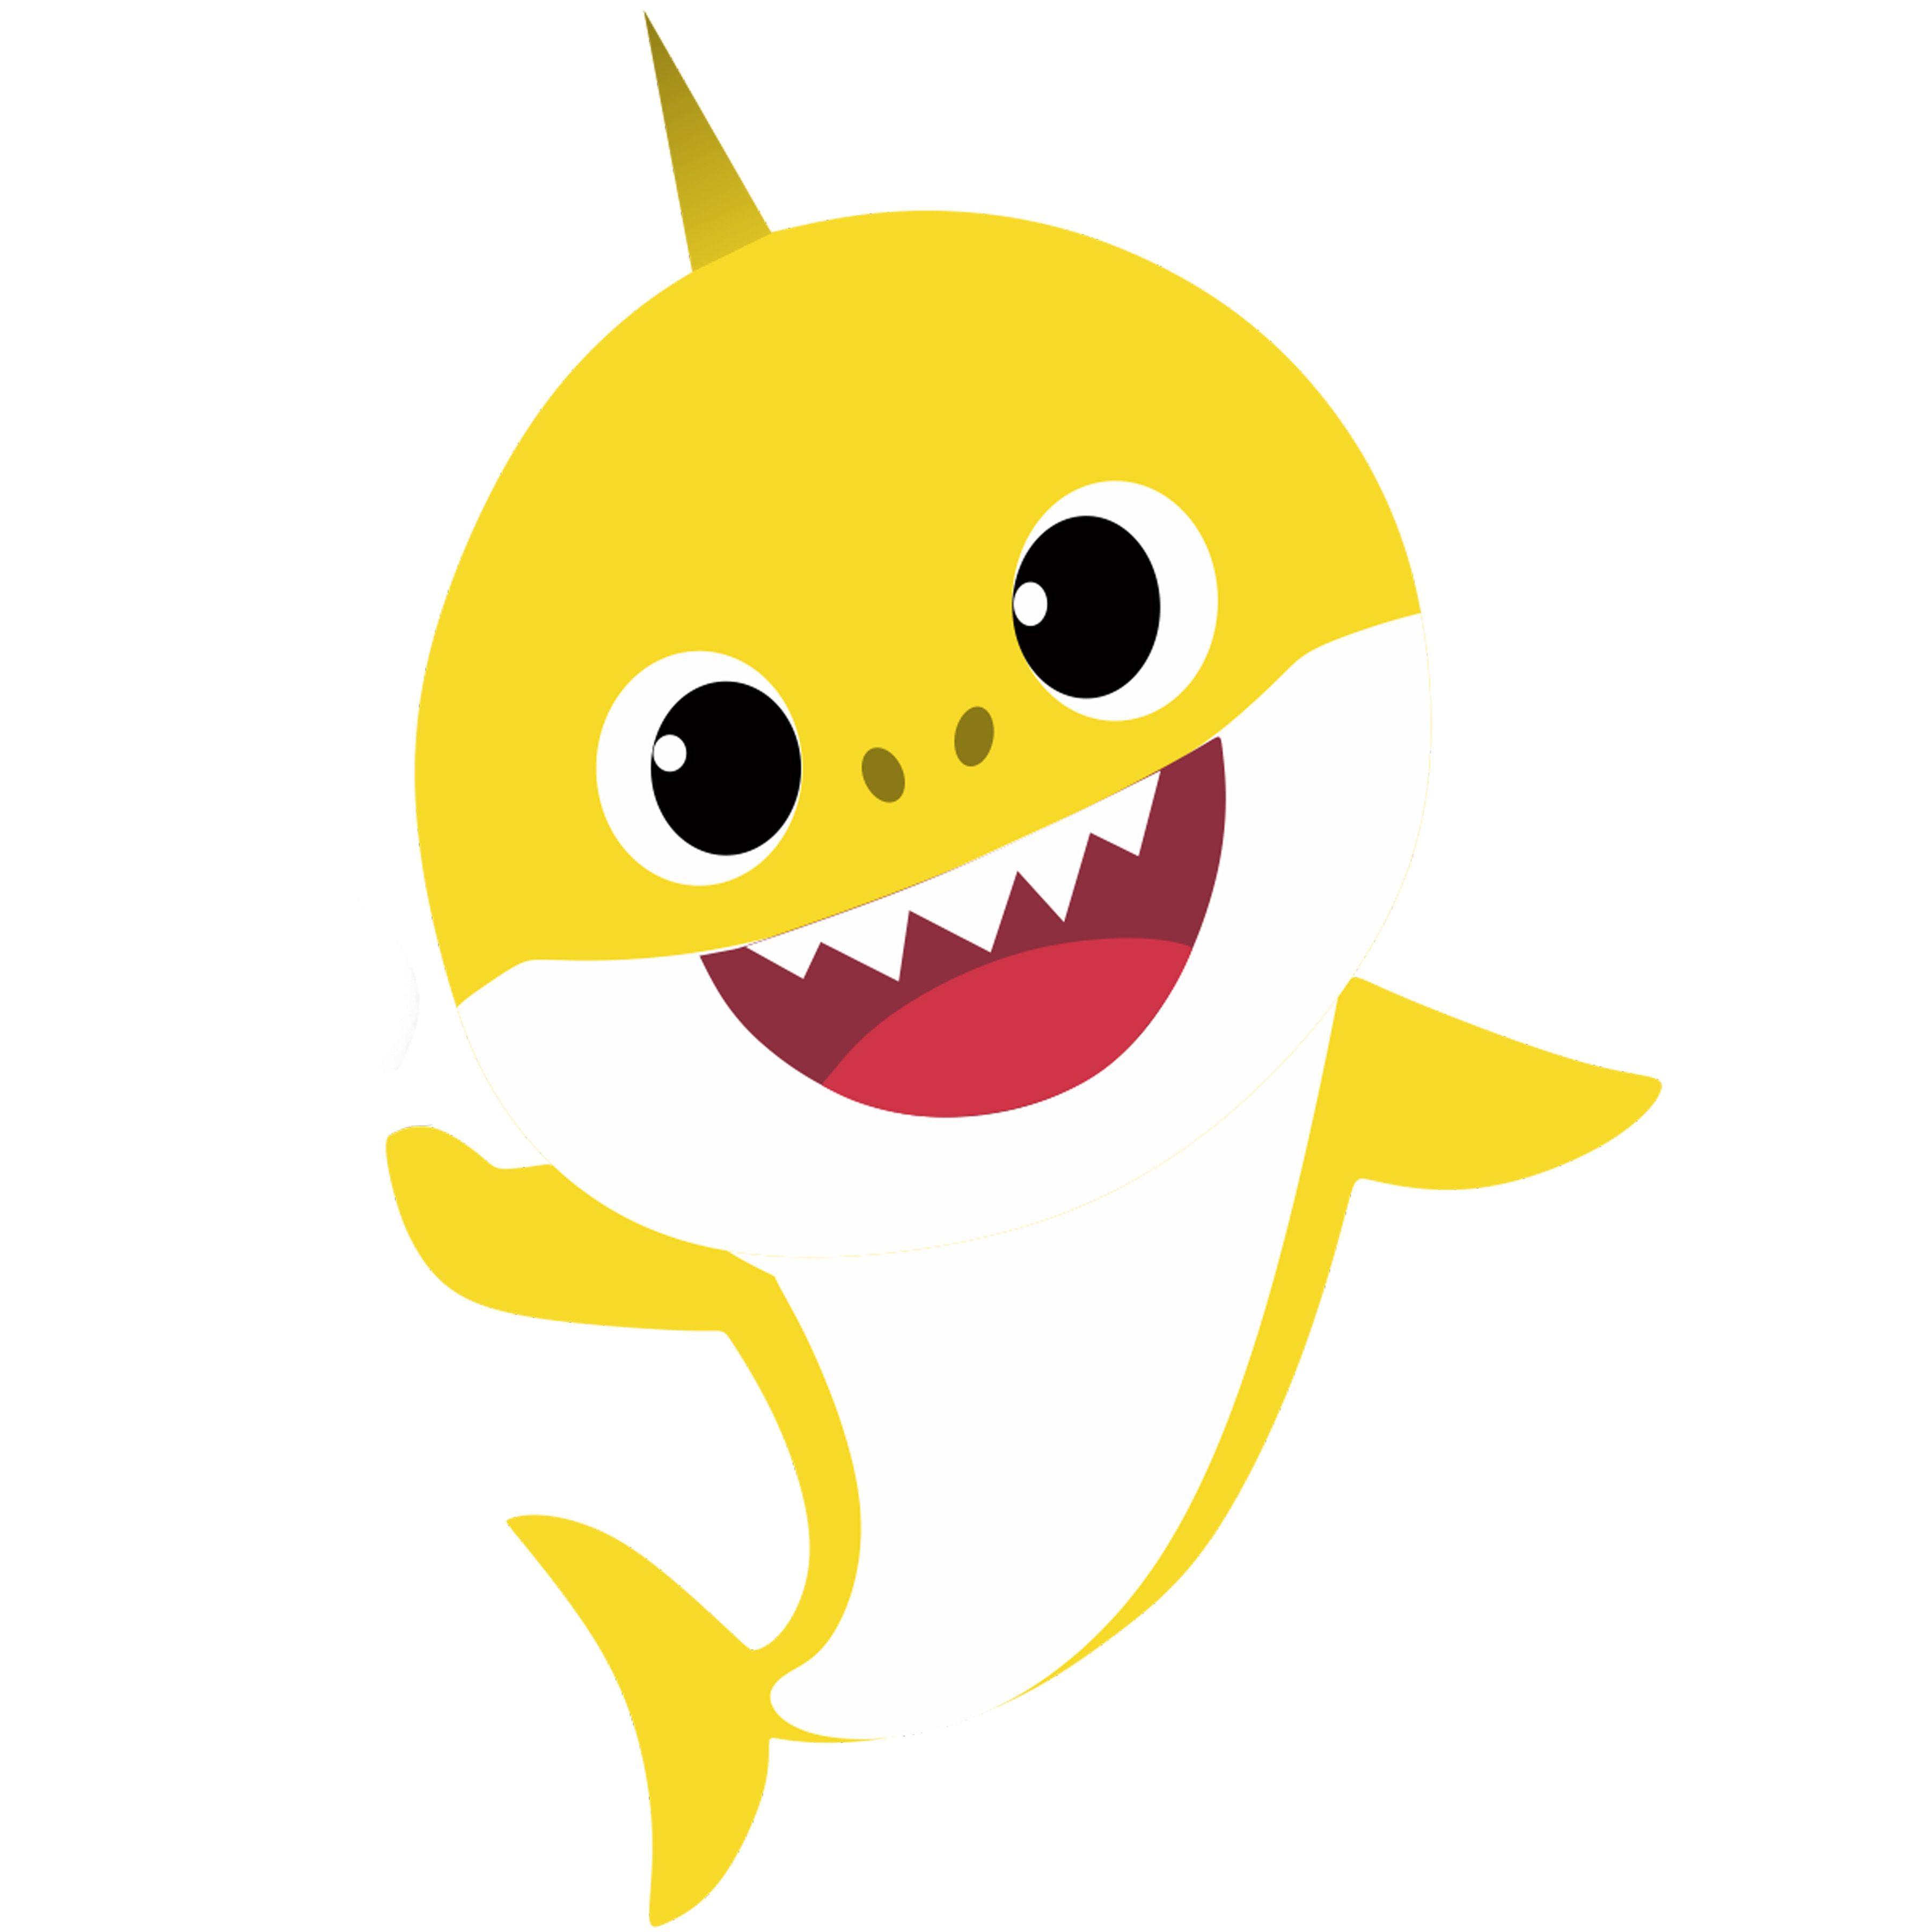 BabyShark SharkFamily mommyshark daddyshark Baby